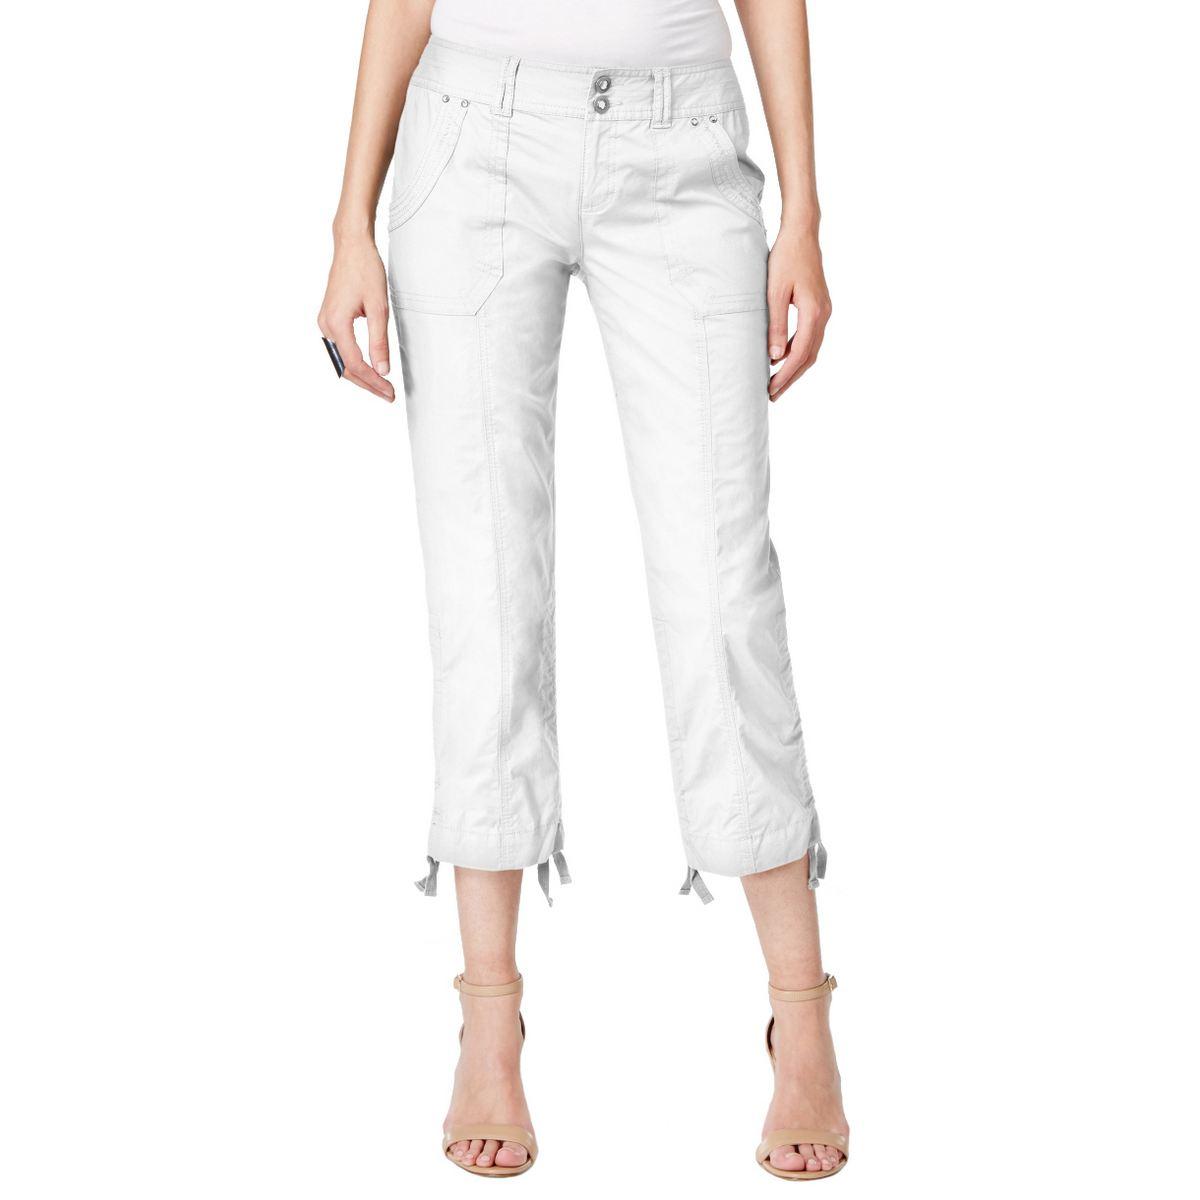 INC NEW Women's Curvy-fit Ruched Hem Cargo Capris, Cropped Pants TEDO